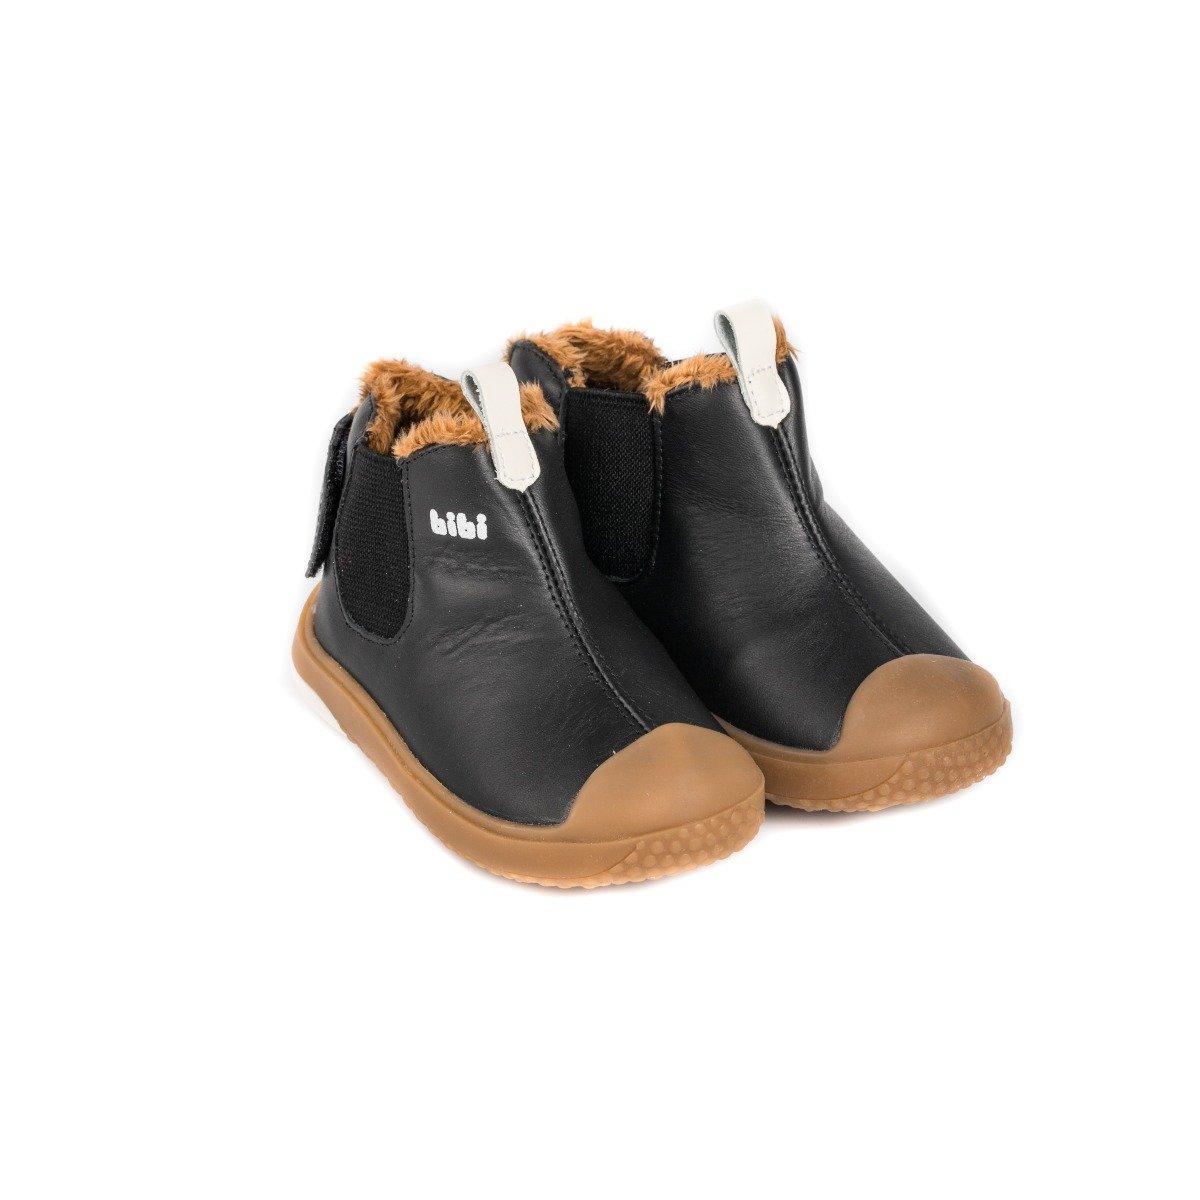 Ghete cu blanita Bibi Shoes Prewalker Black imagine